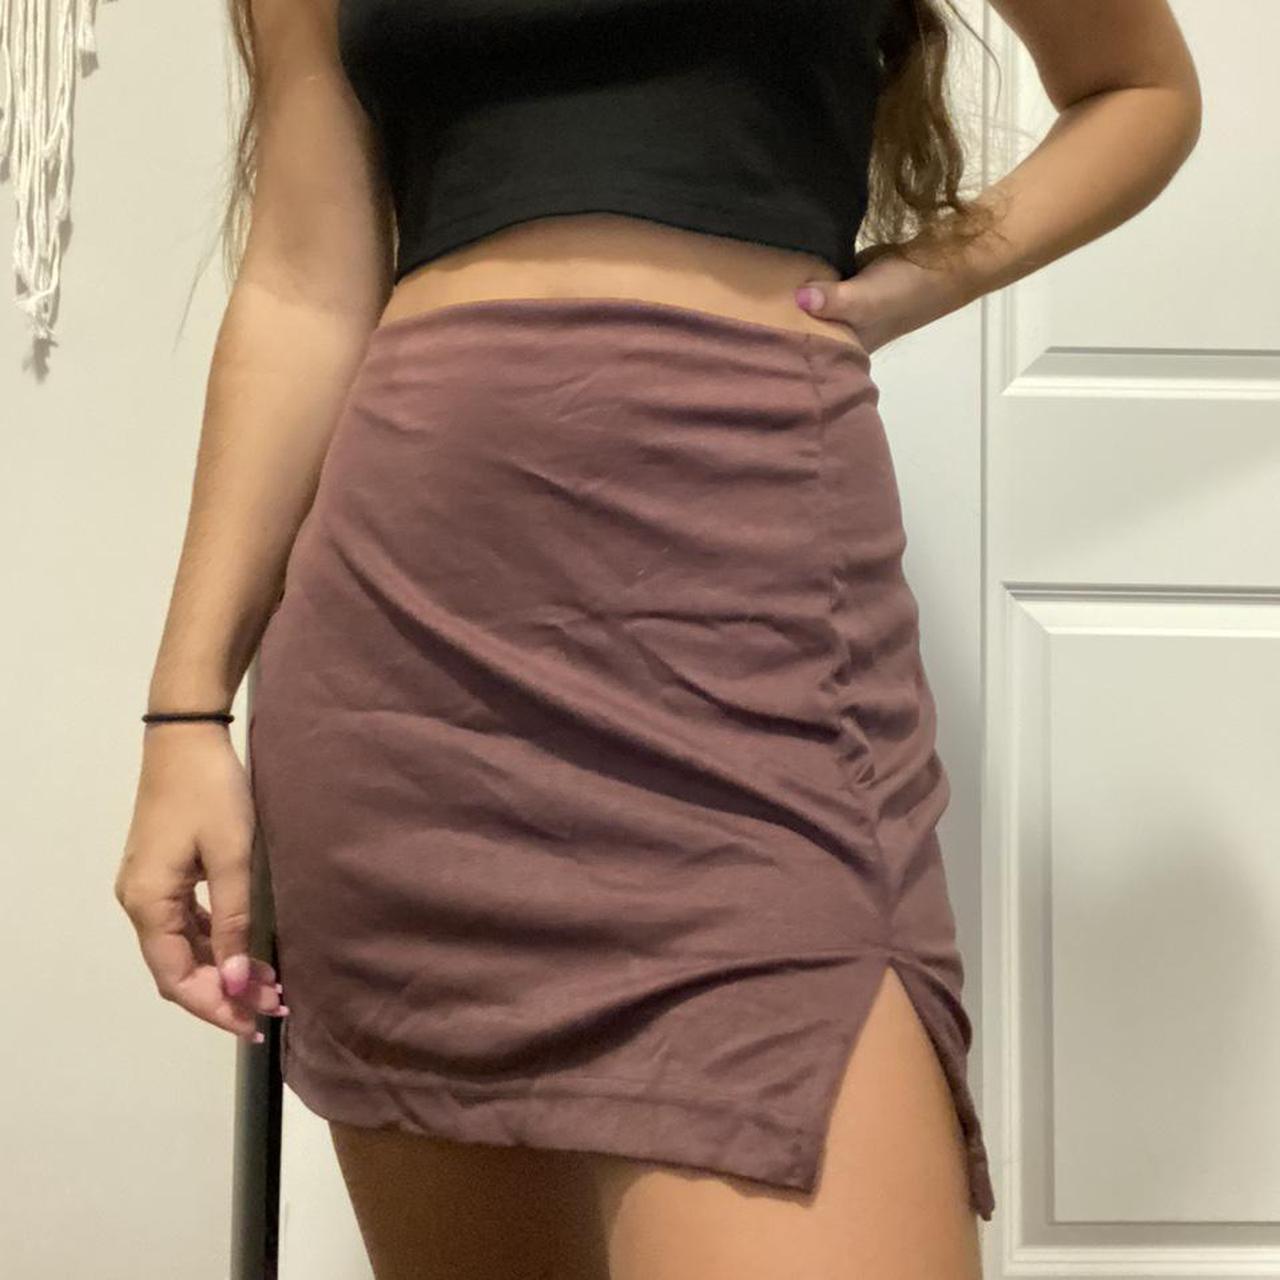 Product Image 1 - Vintage brown skirt. I'm so